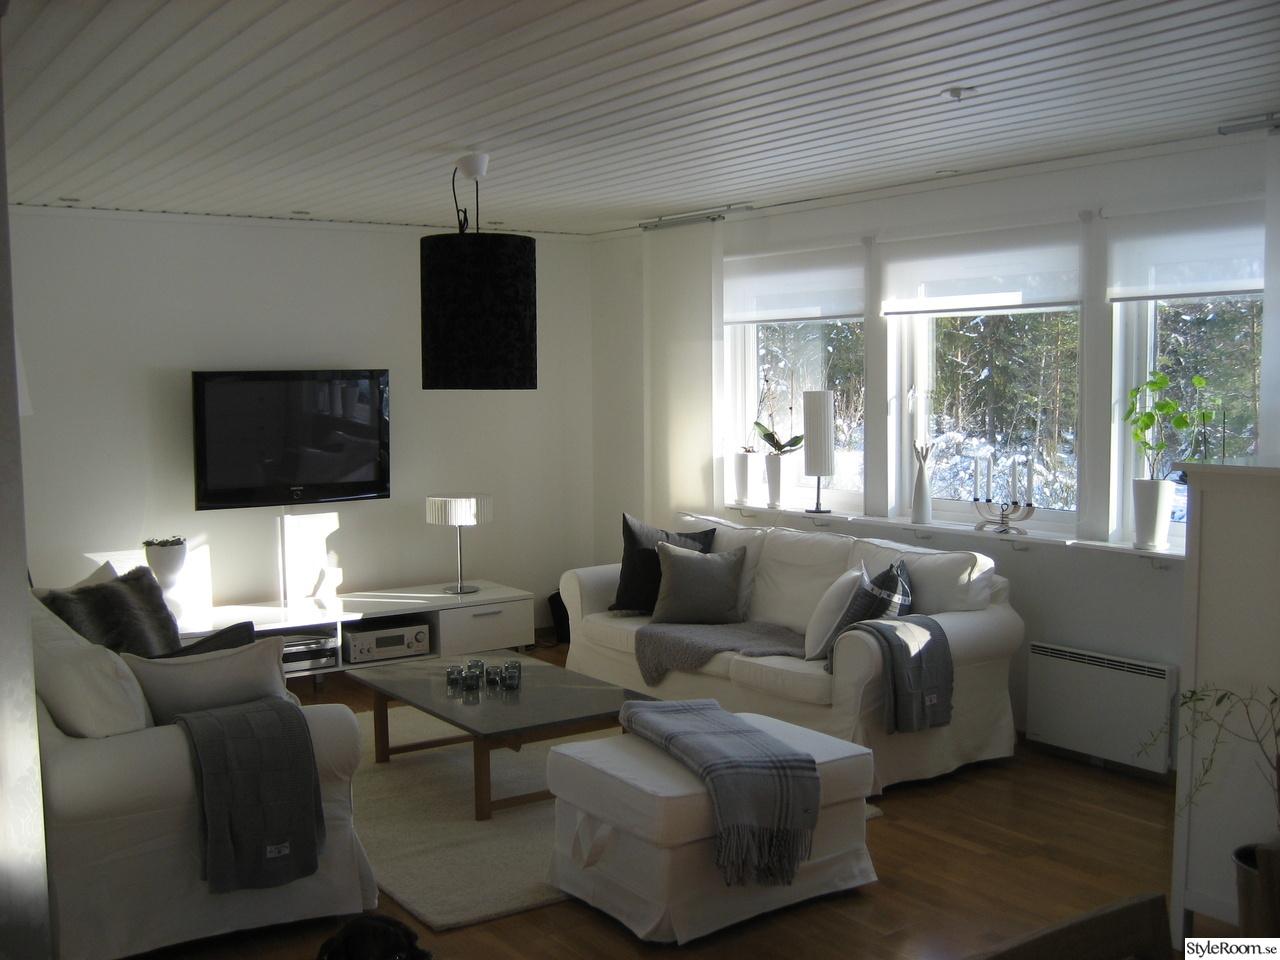 Inredning inspiration inredning sovrum : Se.indogate.com | Vardagsrum Med Stora Fönster